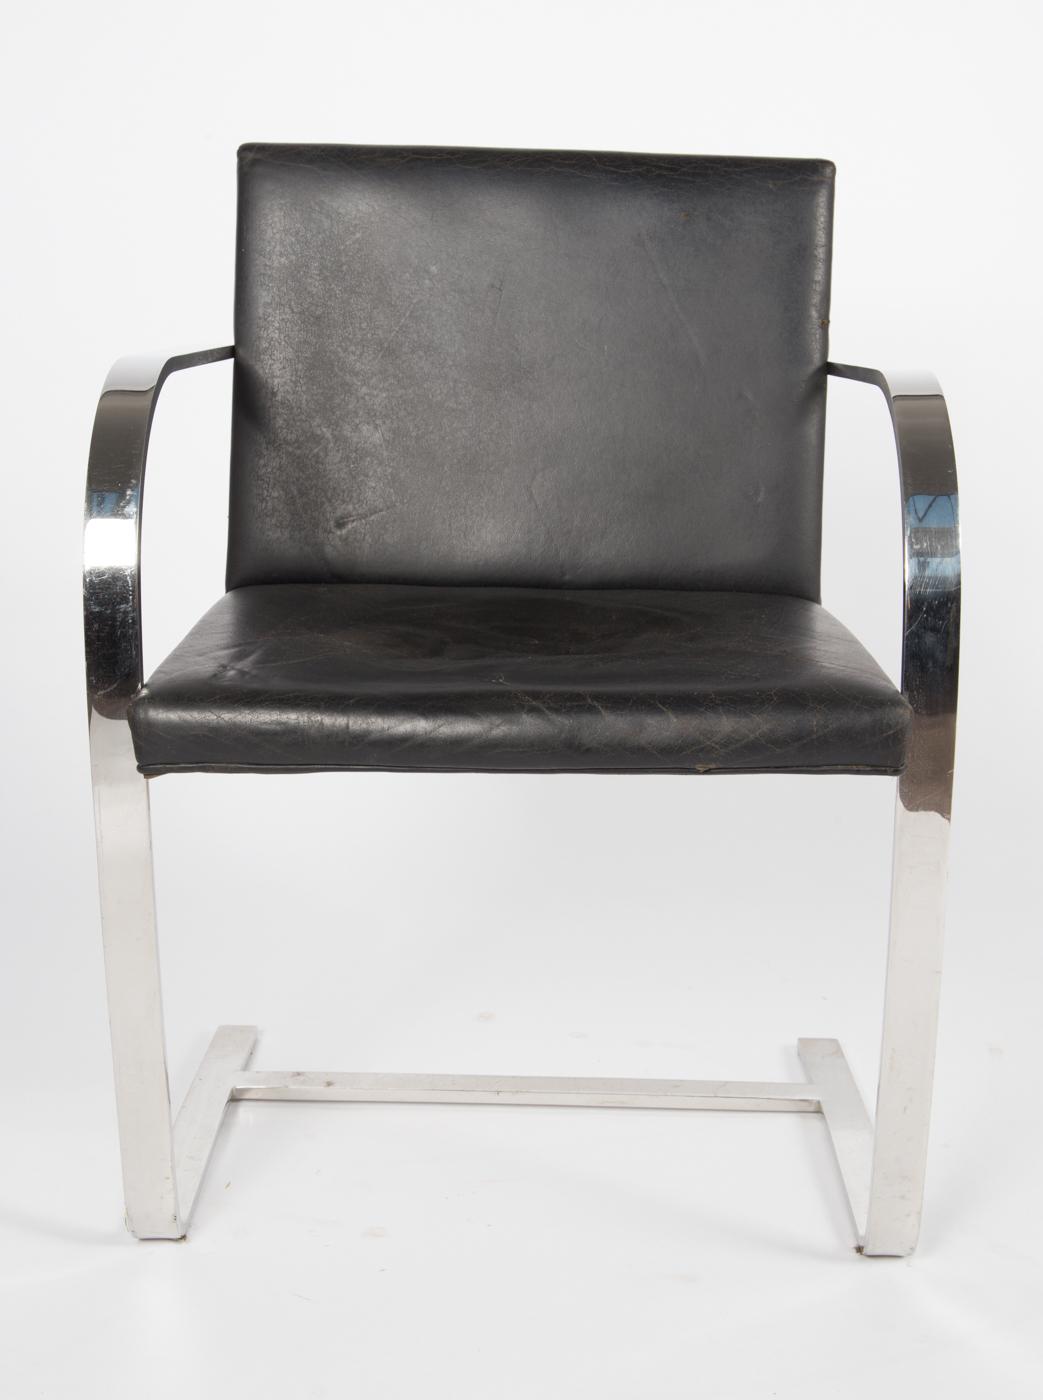 Brno Stuhl knoll brno chairs sumptuous design ideas mies der rohe